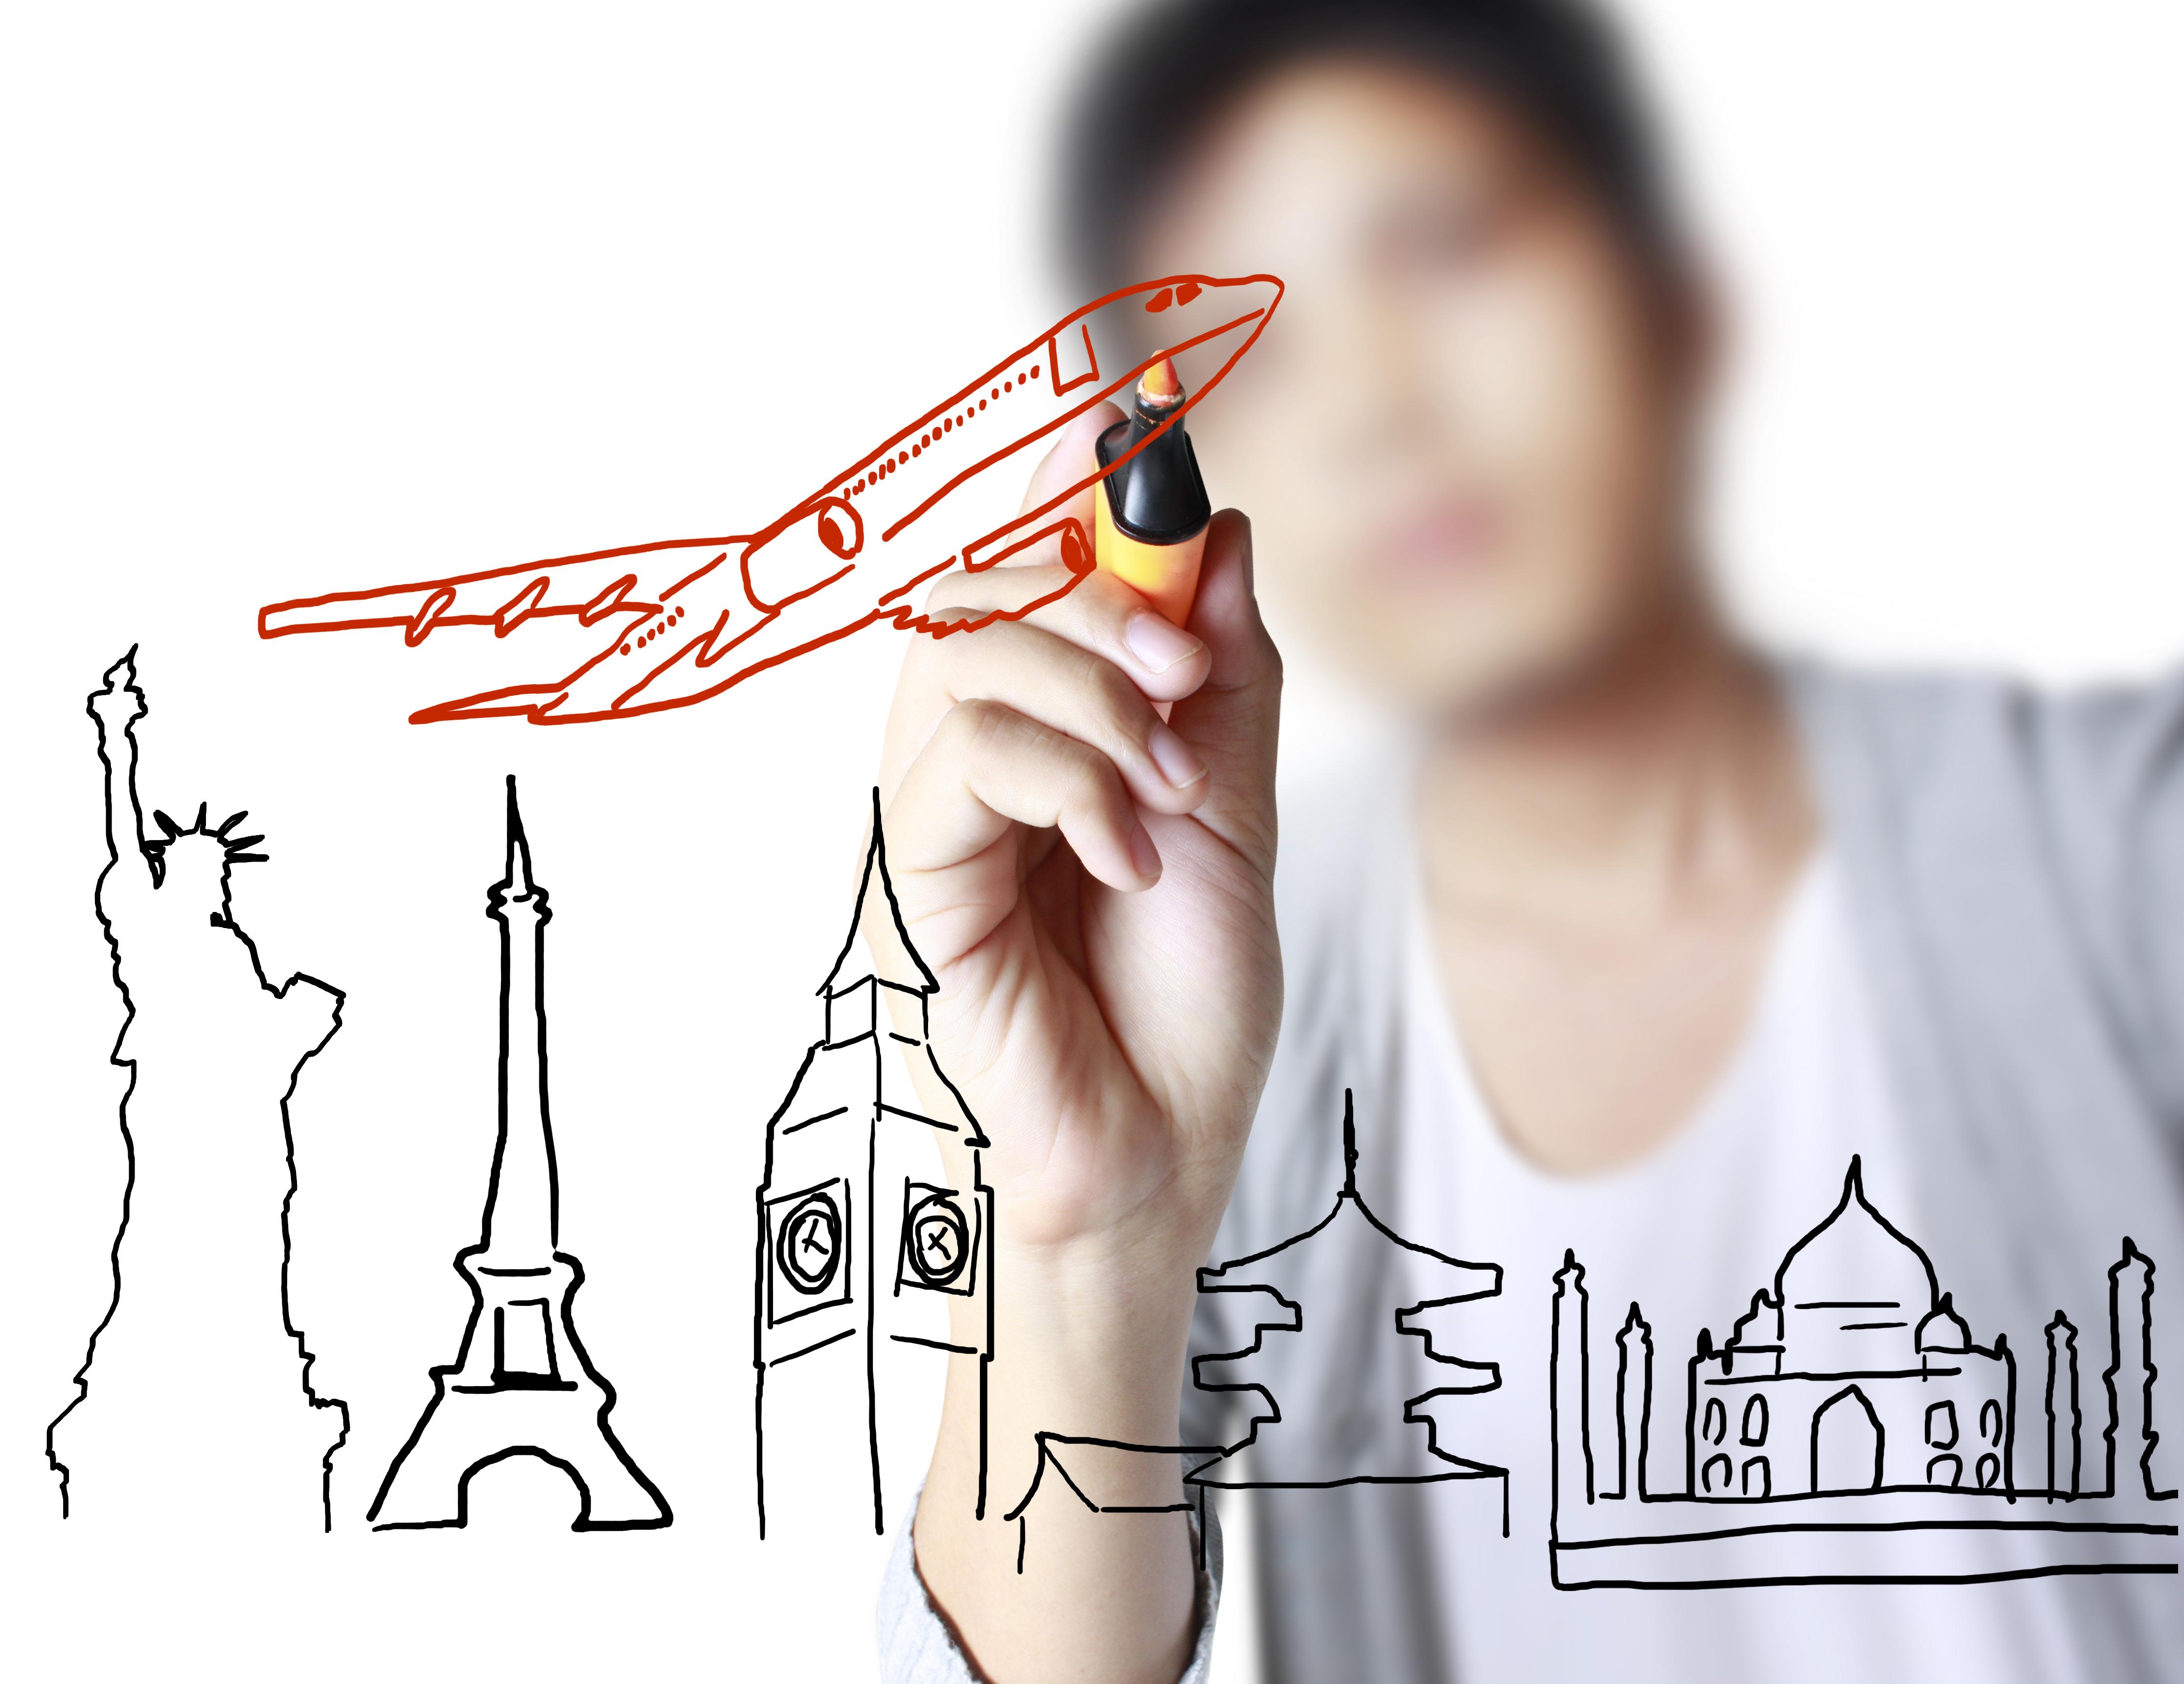 International student illustration